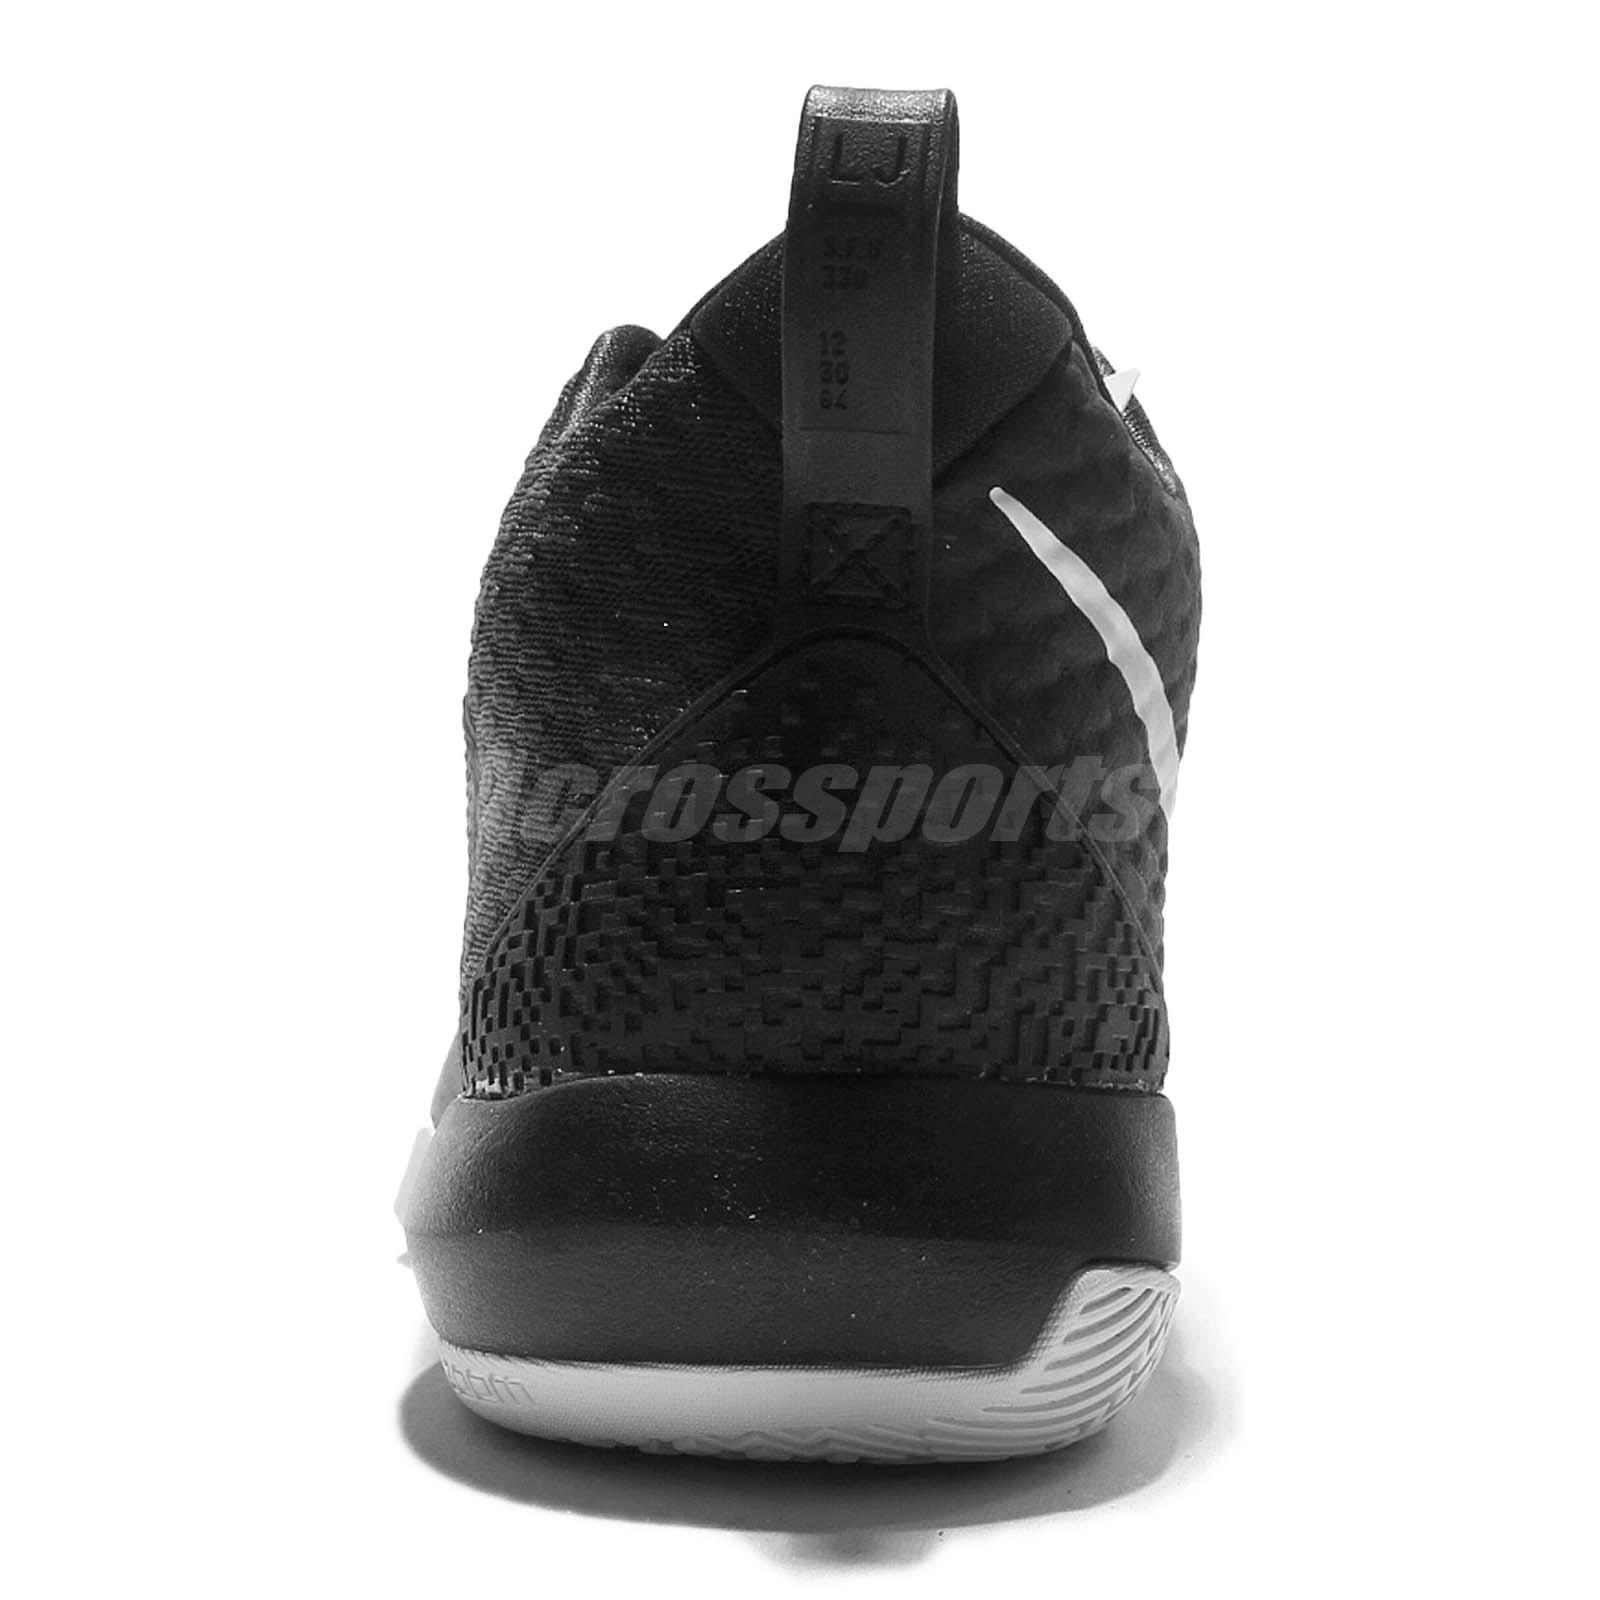 nike lebron ambassador 9 (IX) black 5